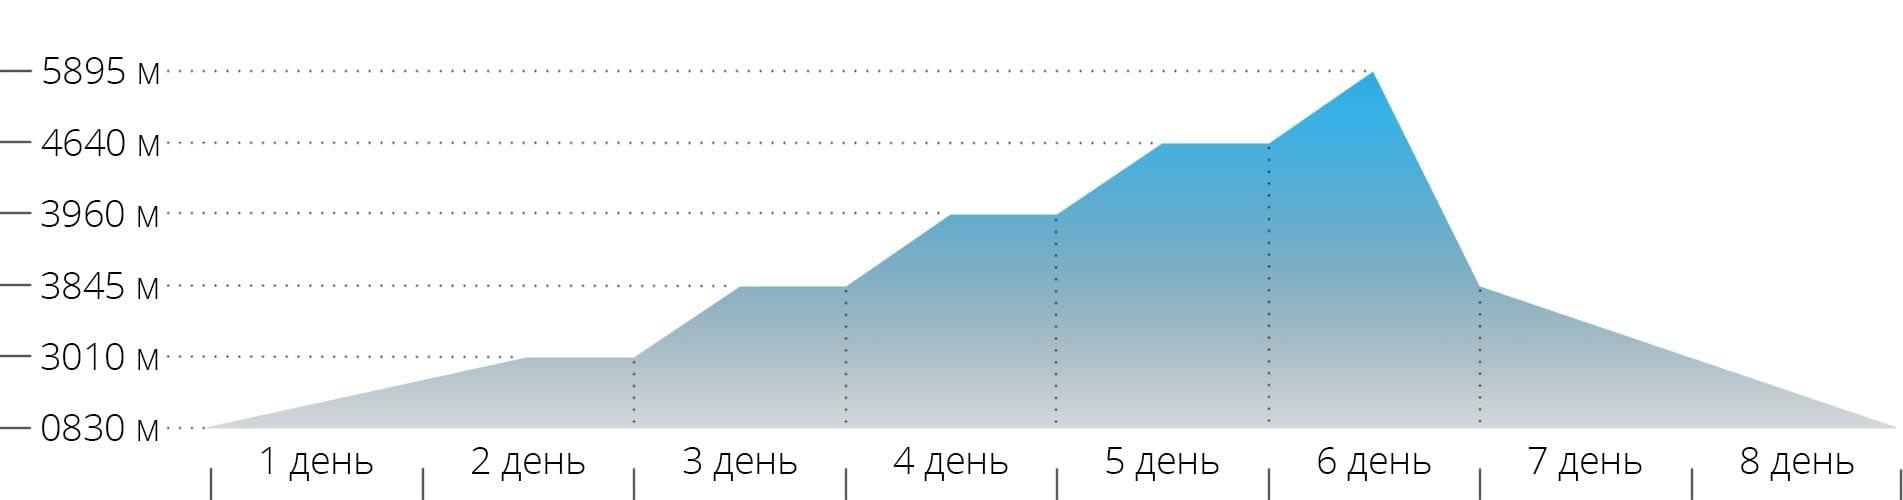 Акклиматизационный график для маршрута Мачаме на Килиманджаро